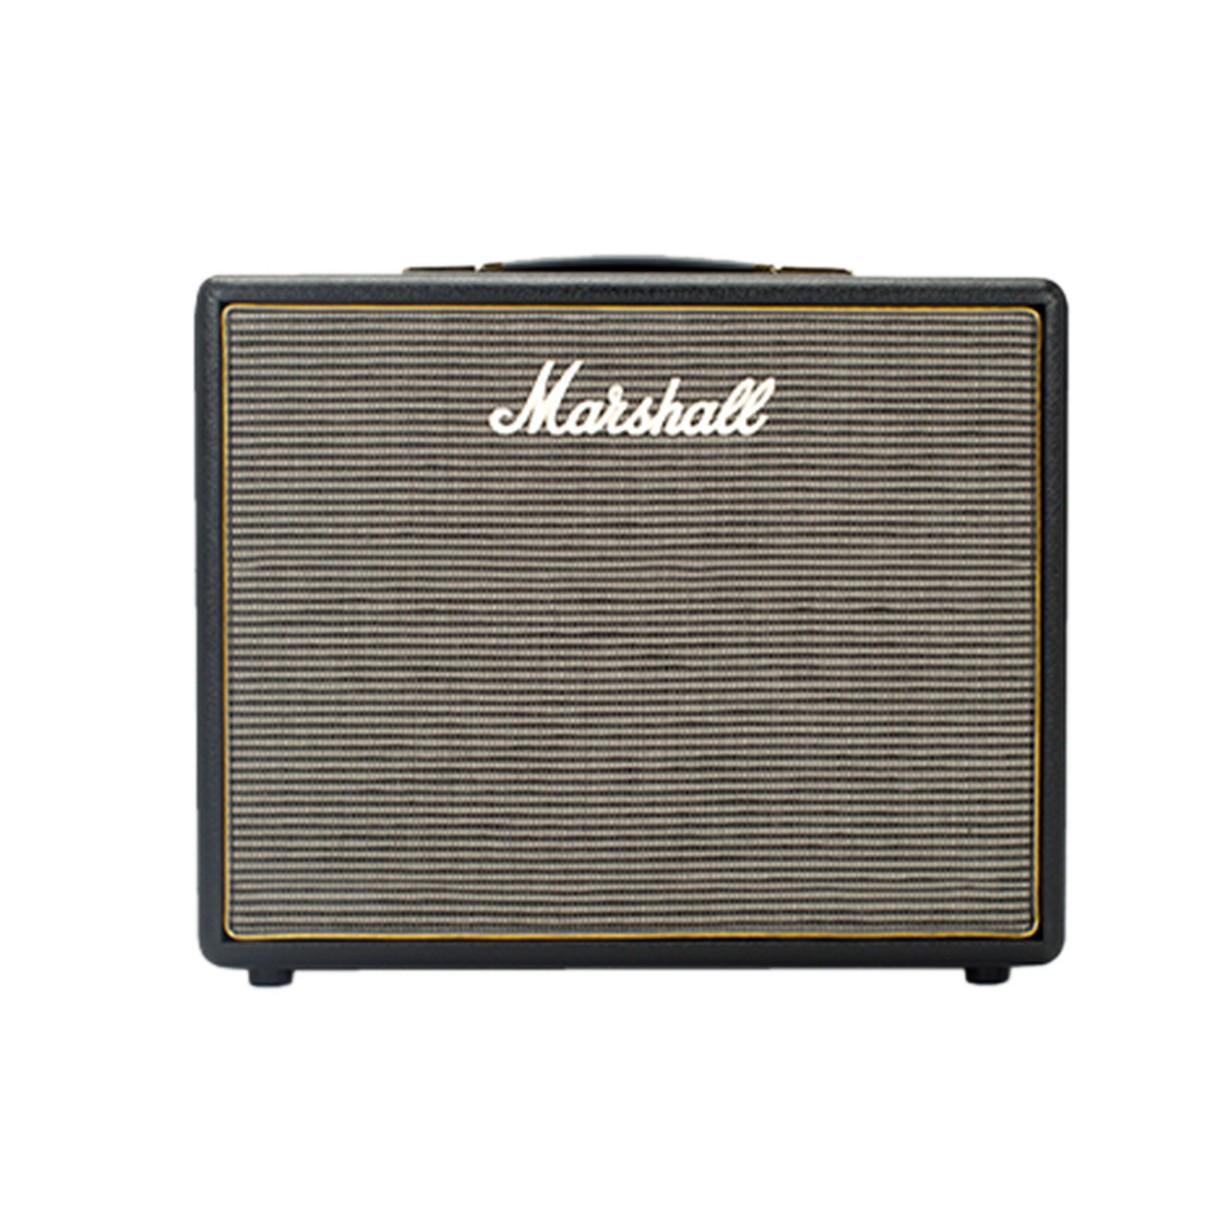 marshall ori5c 1x8 5 watt combo amp. Black Bedroom Furniture Sets. Home Design Ideas